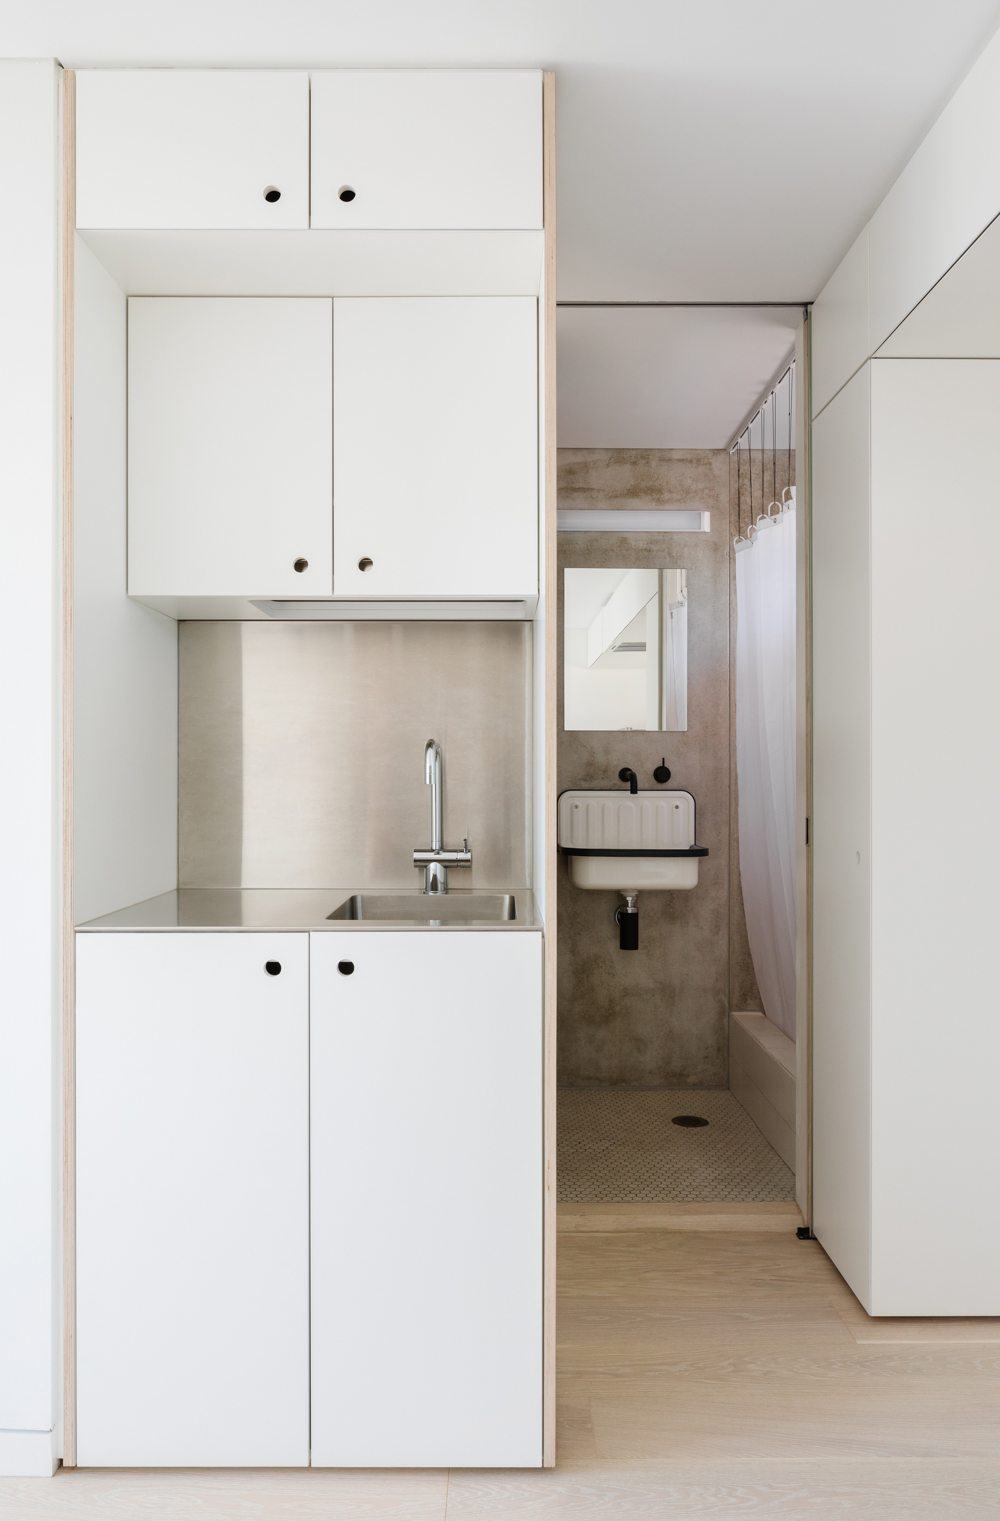 Japanese inspired apartment design